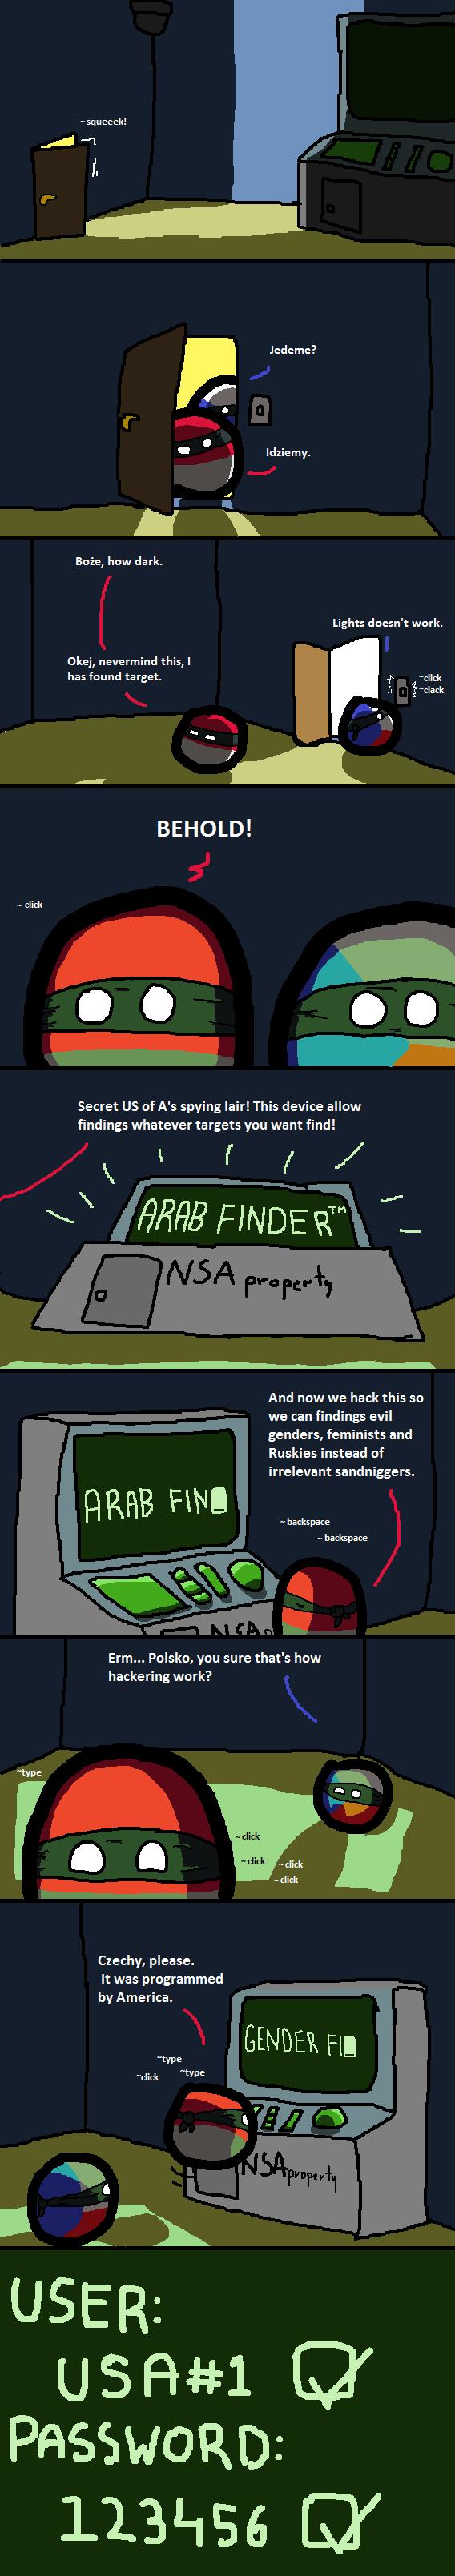 Hackering